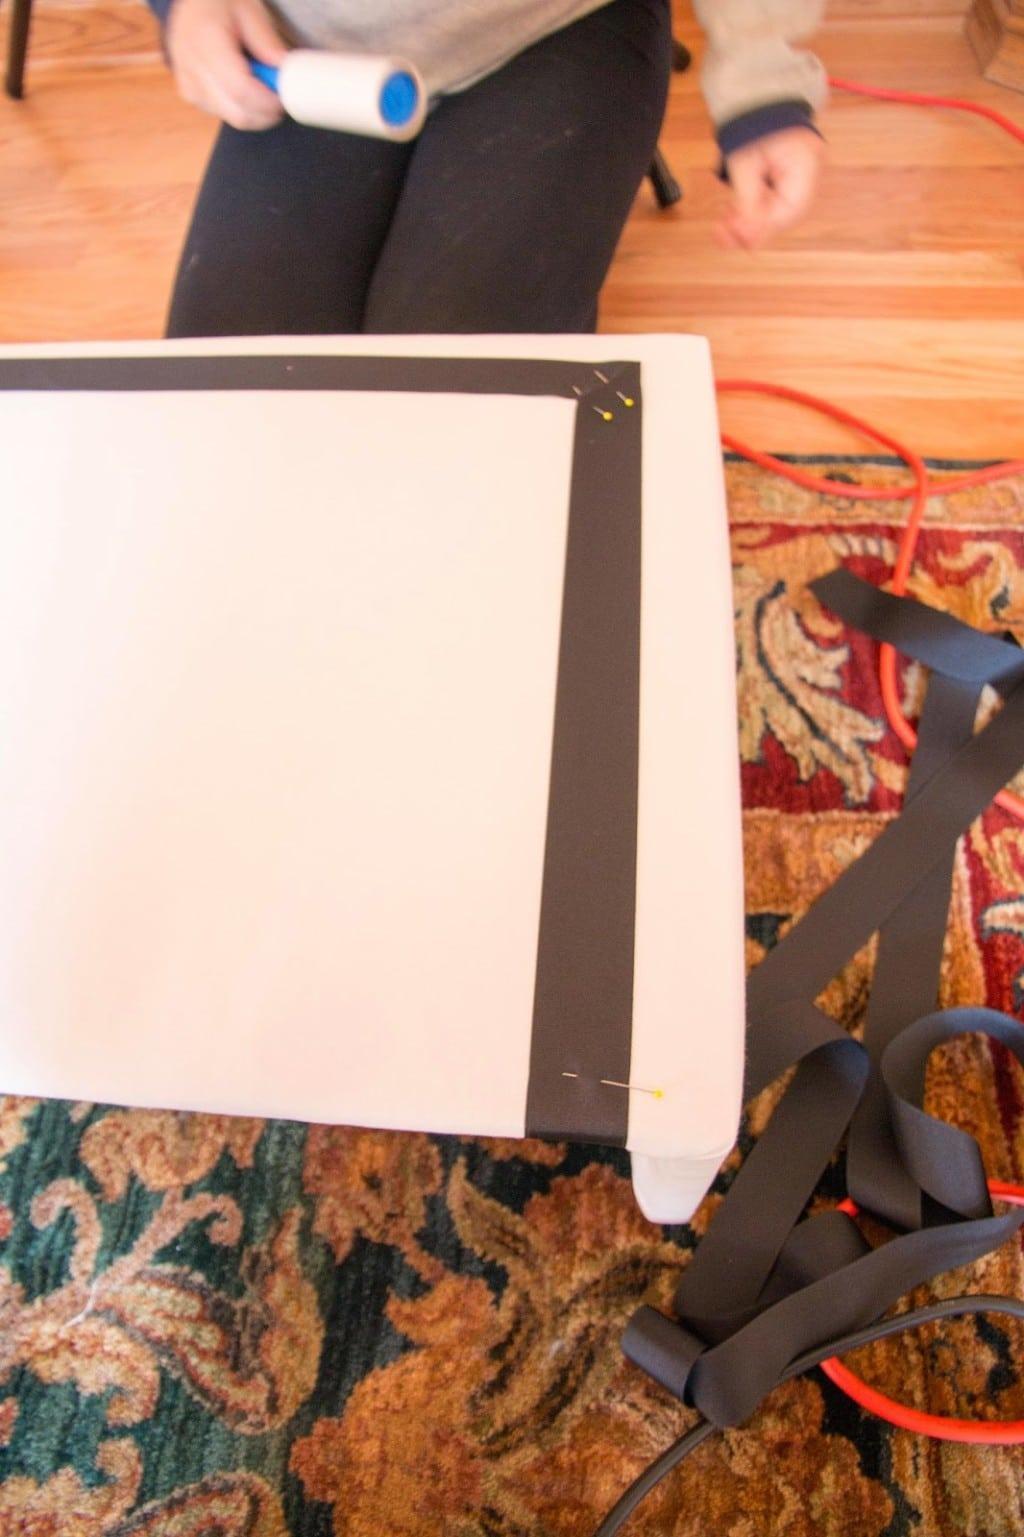 making a DIY Pelmet Box with grosgrain ribbon on floor